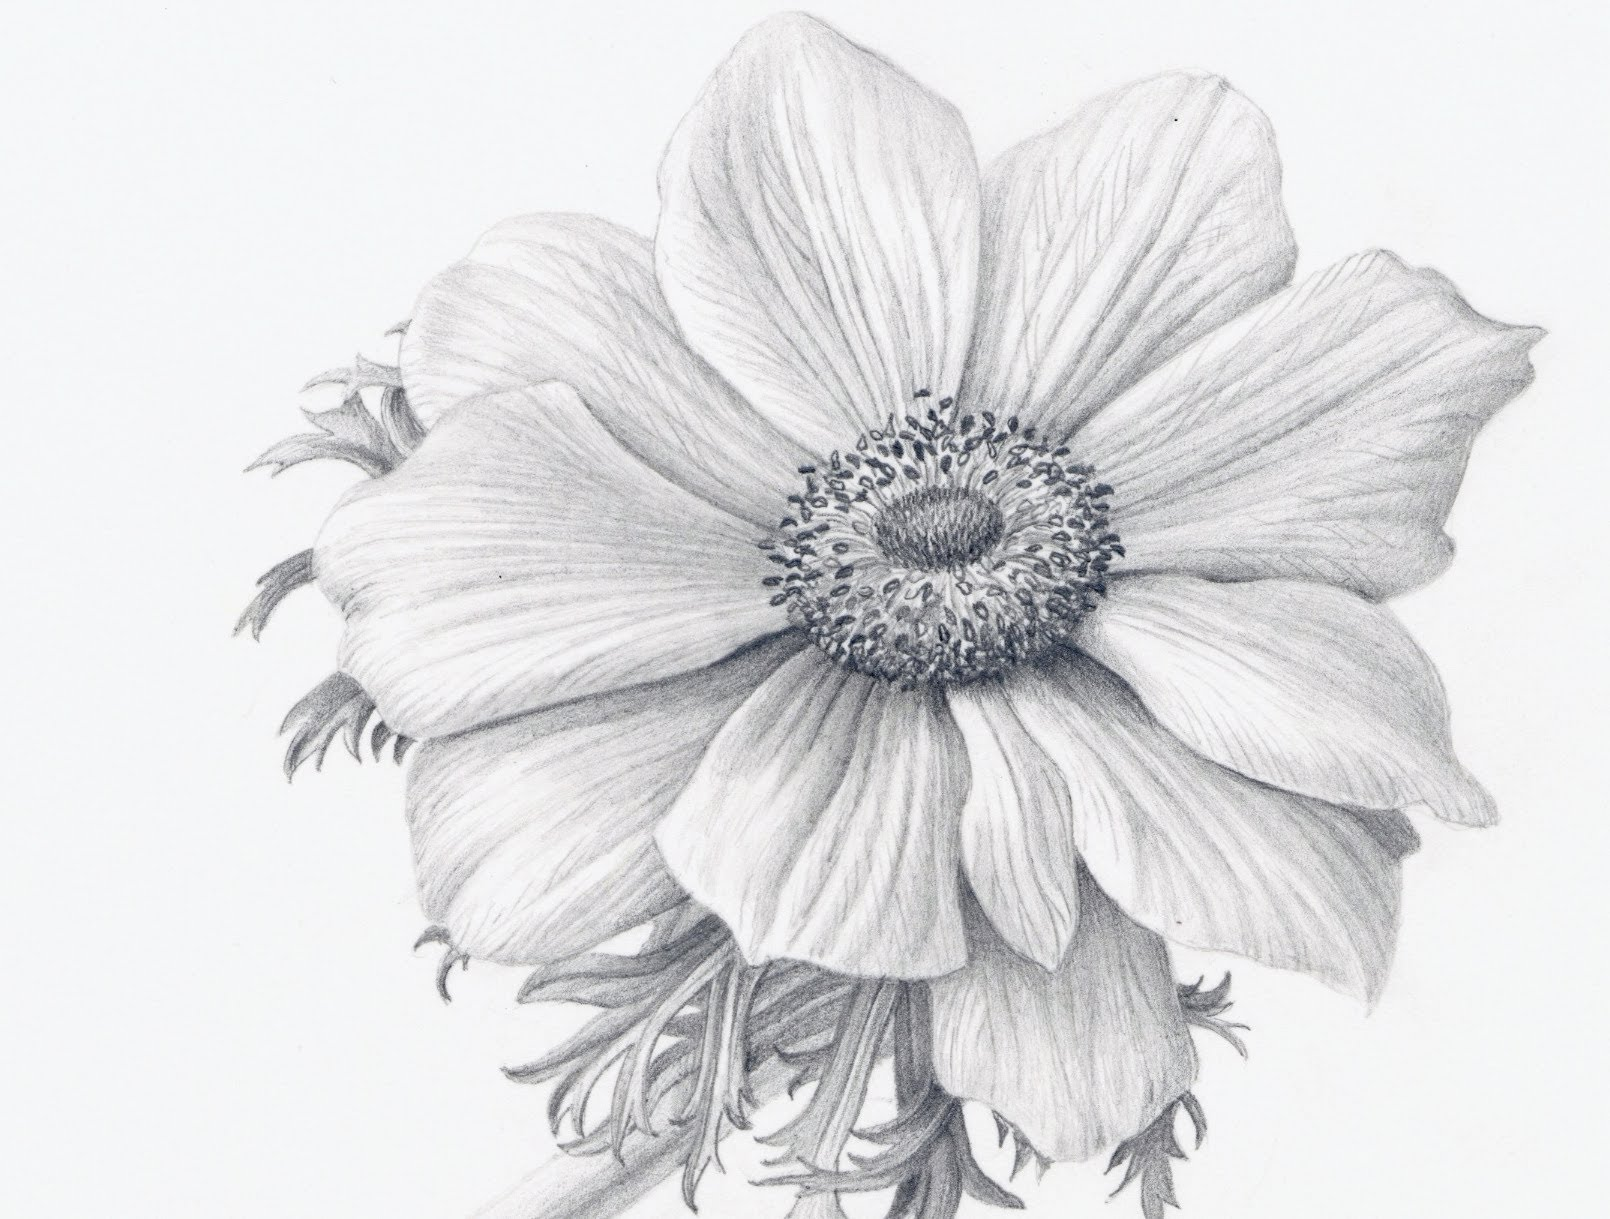 Drawn daisy realistic Flowers How Realistically  Draw